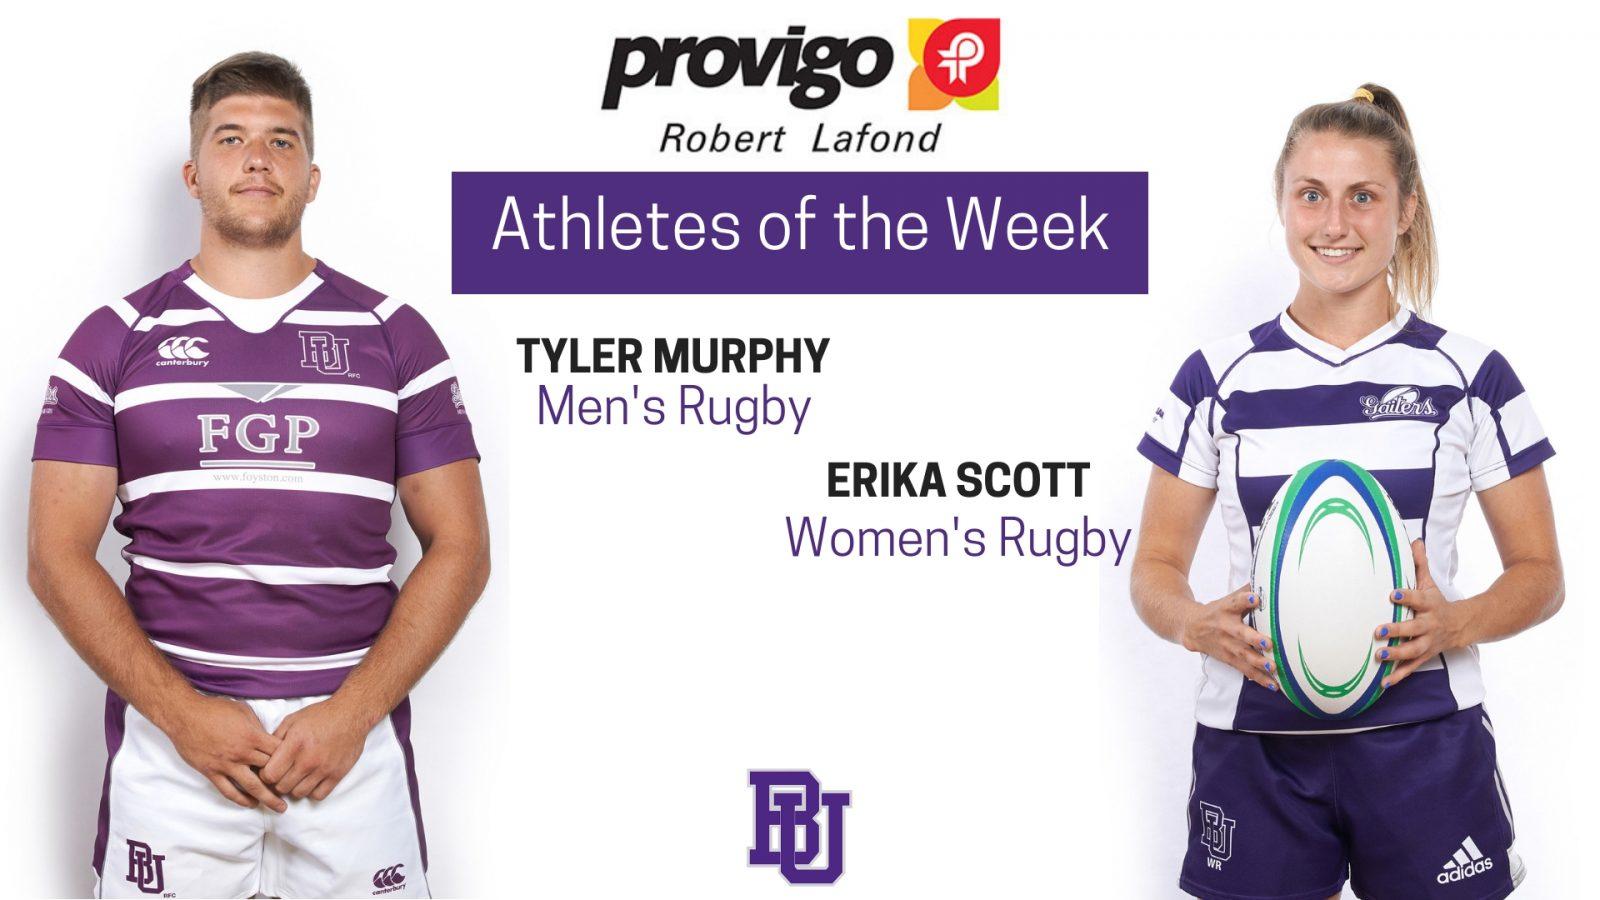 Scott and Murphy named Provigo, Robert Lafond Bishop's Athletes of the Week